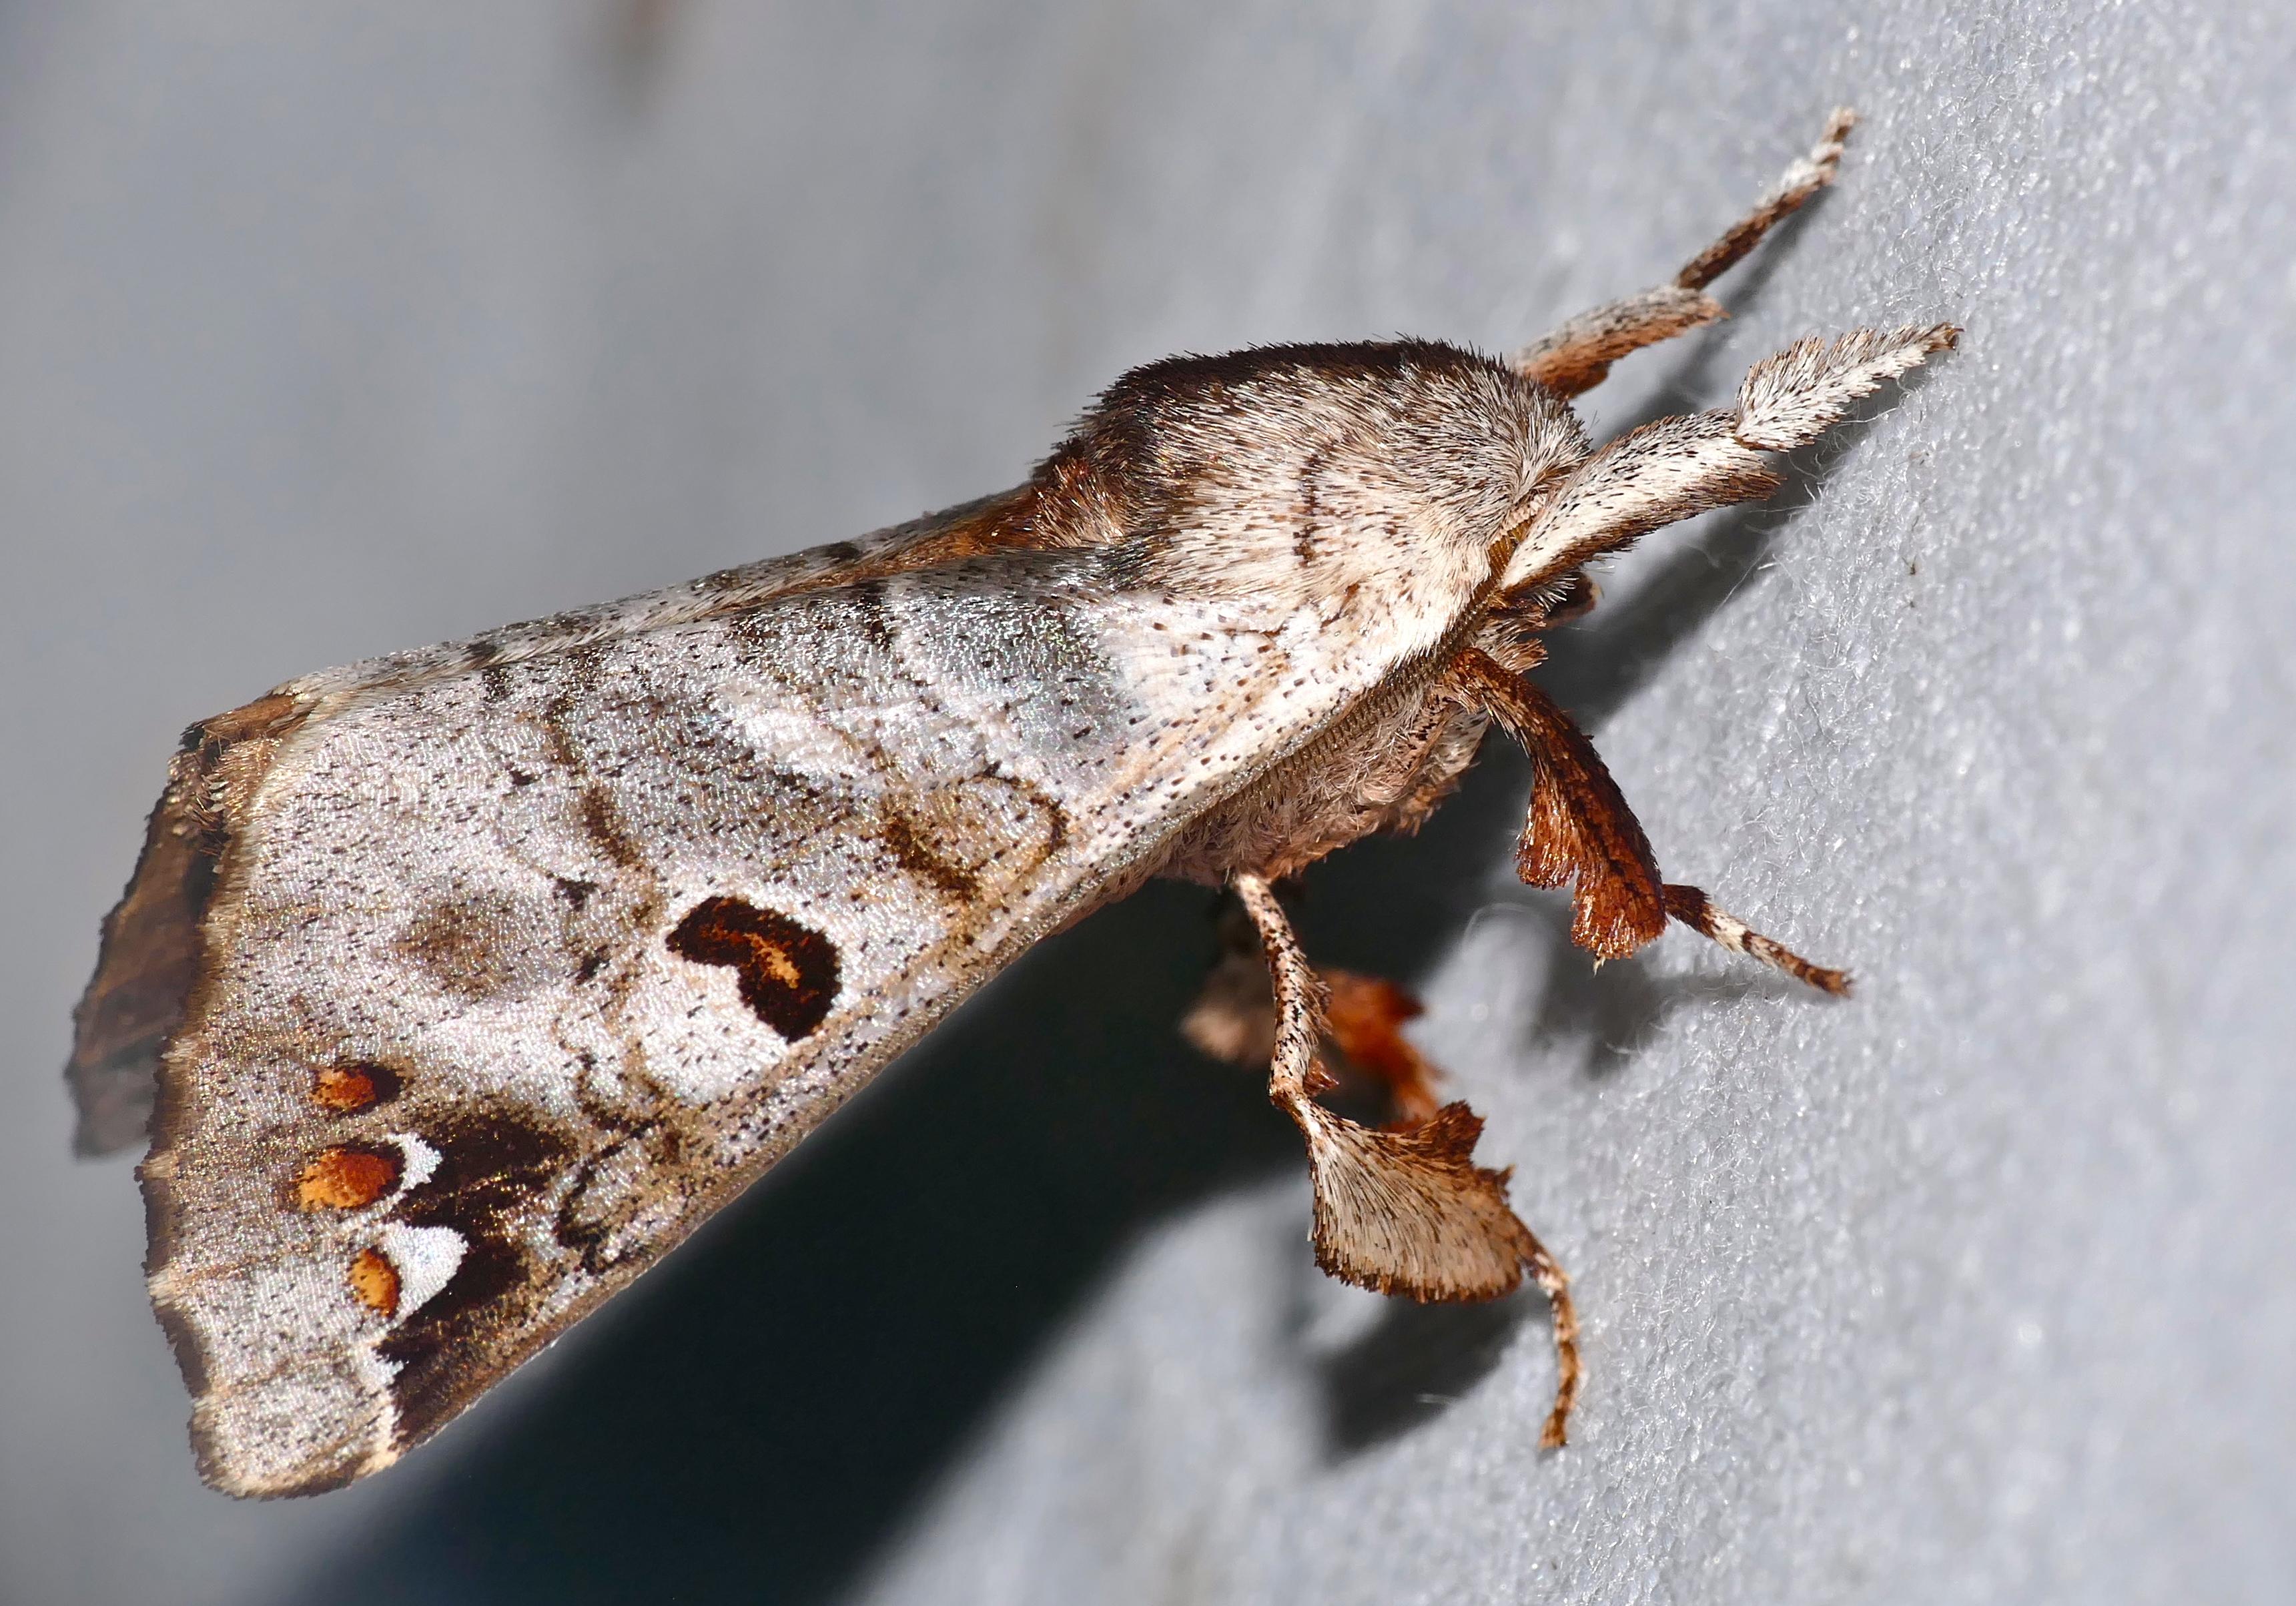 Sưu tập Bộ cánh vẩy  - Page 6 Apatelodid_Moth_%28Pantelodes_satellitia%29_%2840938171901%29